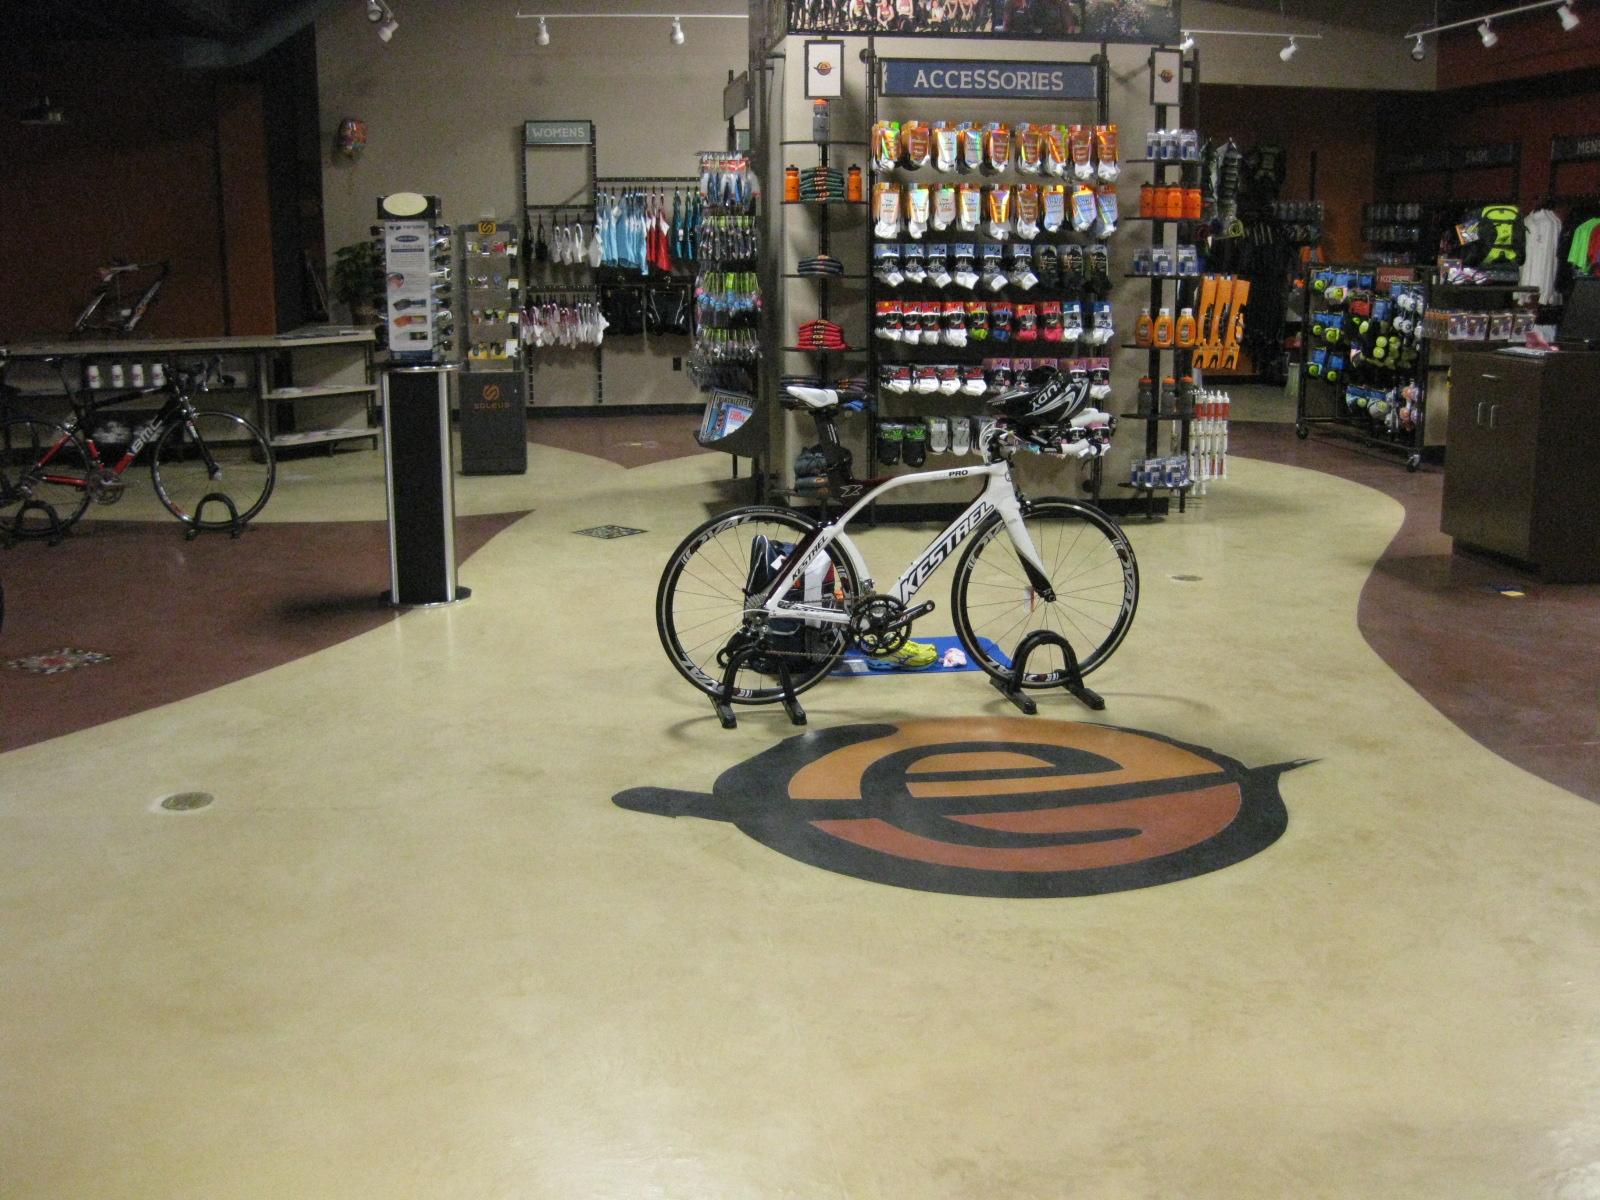 retail-concrete-floor-overlay.jpg